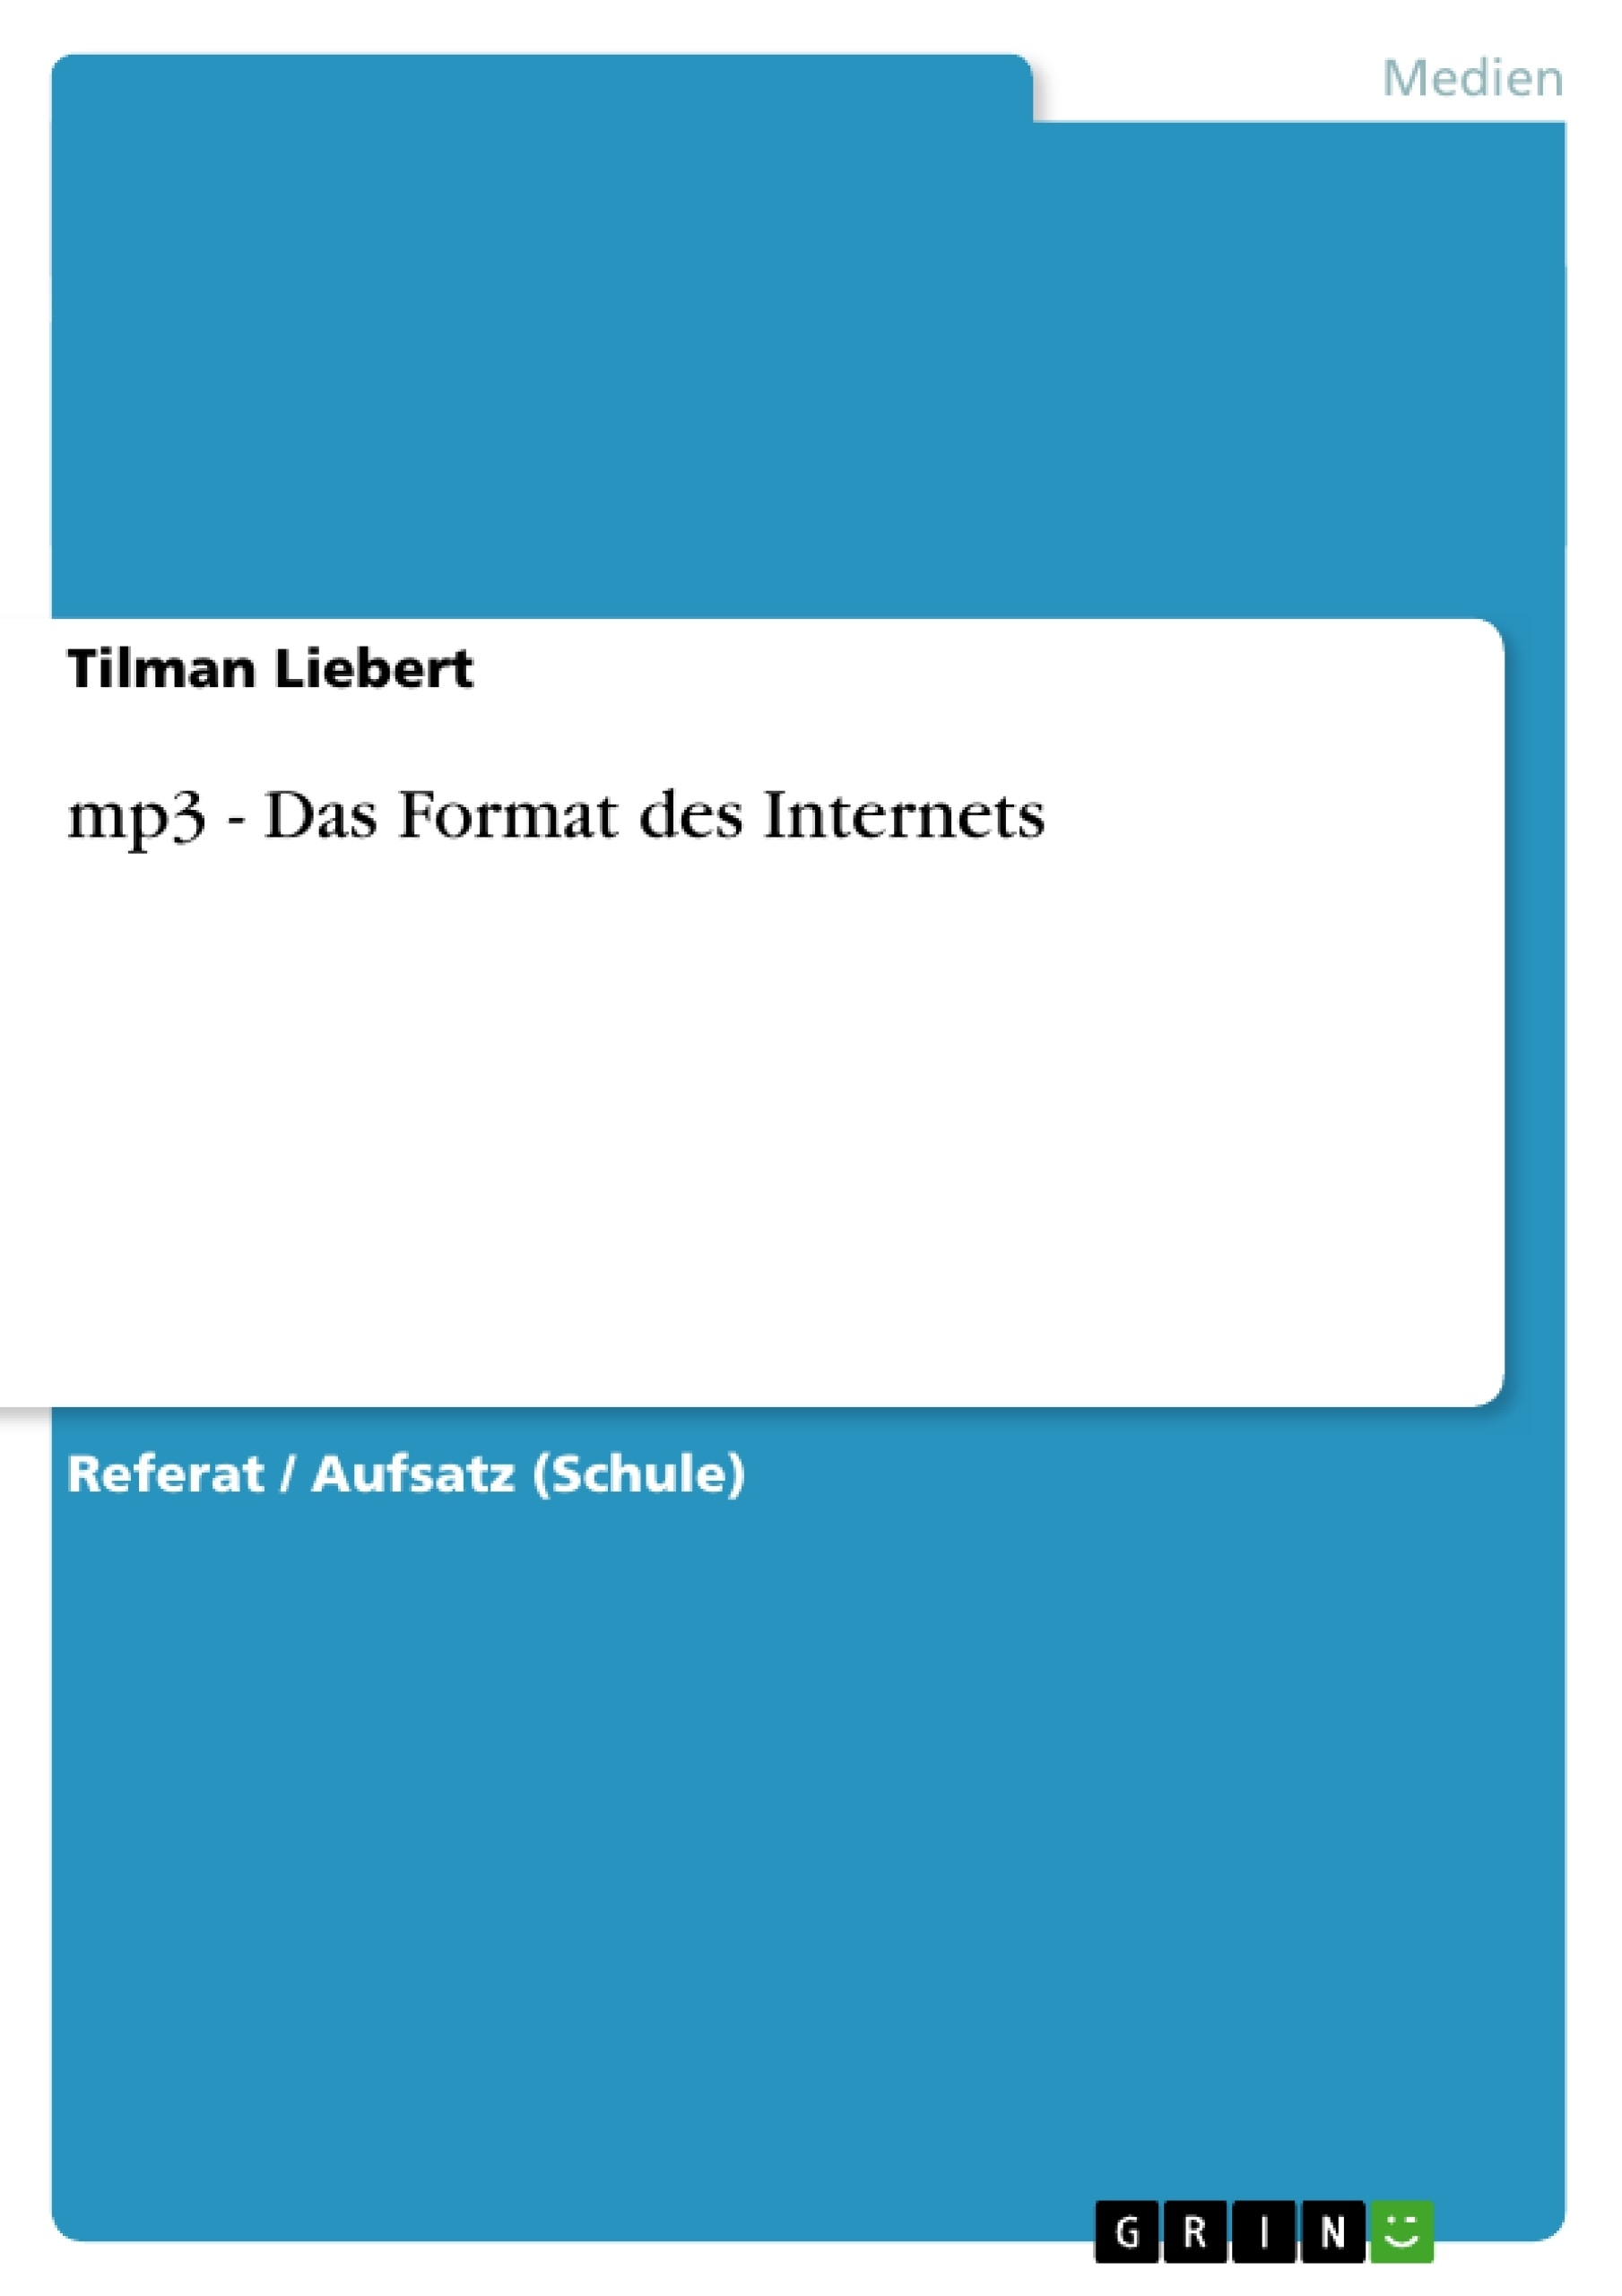 Titel: mp3 - Das Format des Internets